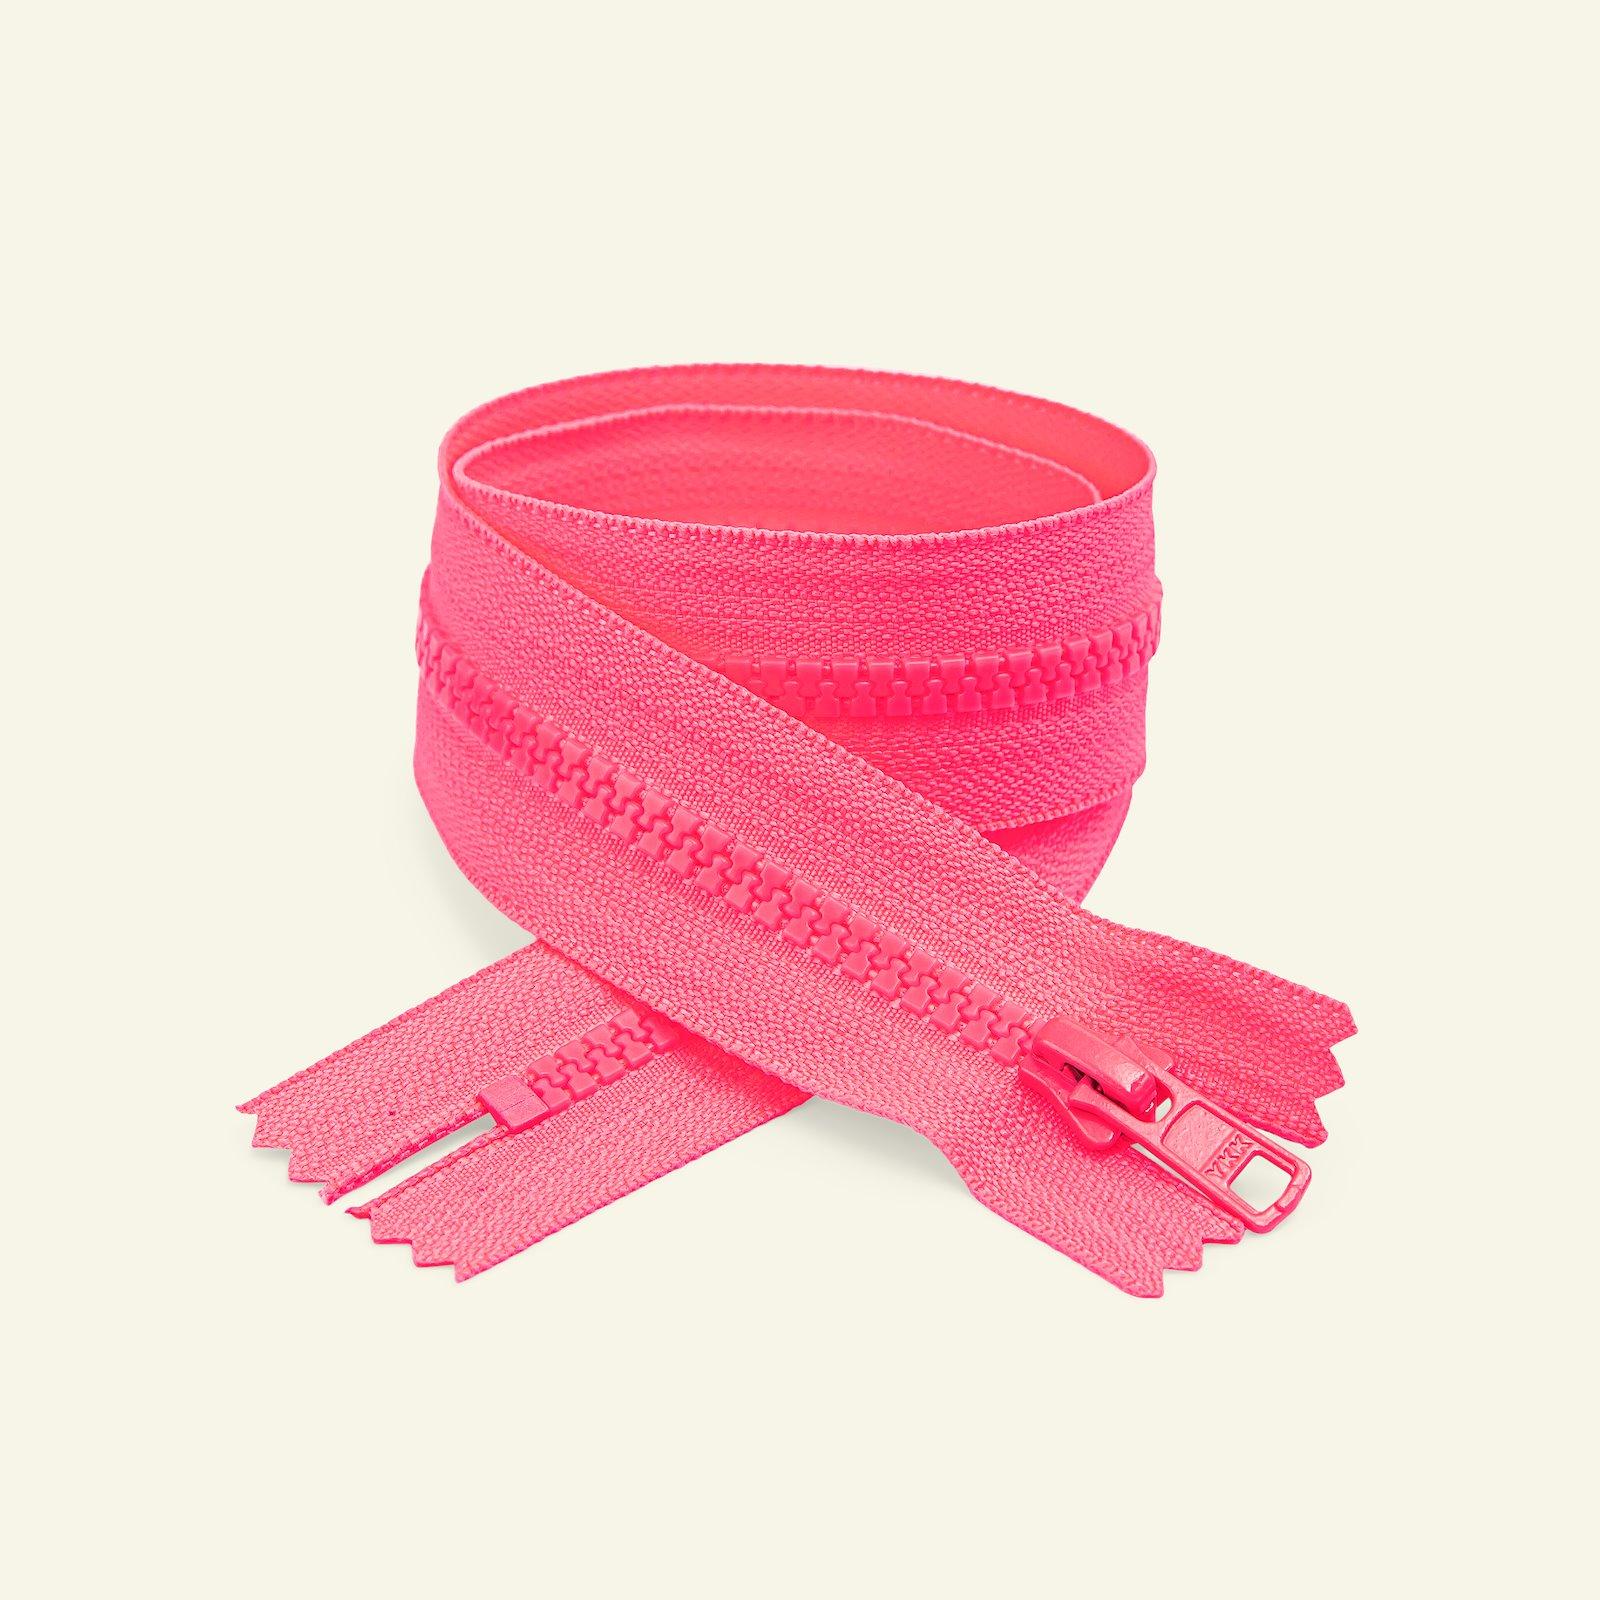 YKK zip 6mm closed end 50cm neon pink x50184_pack